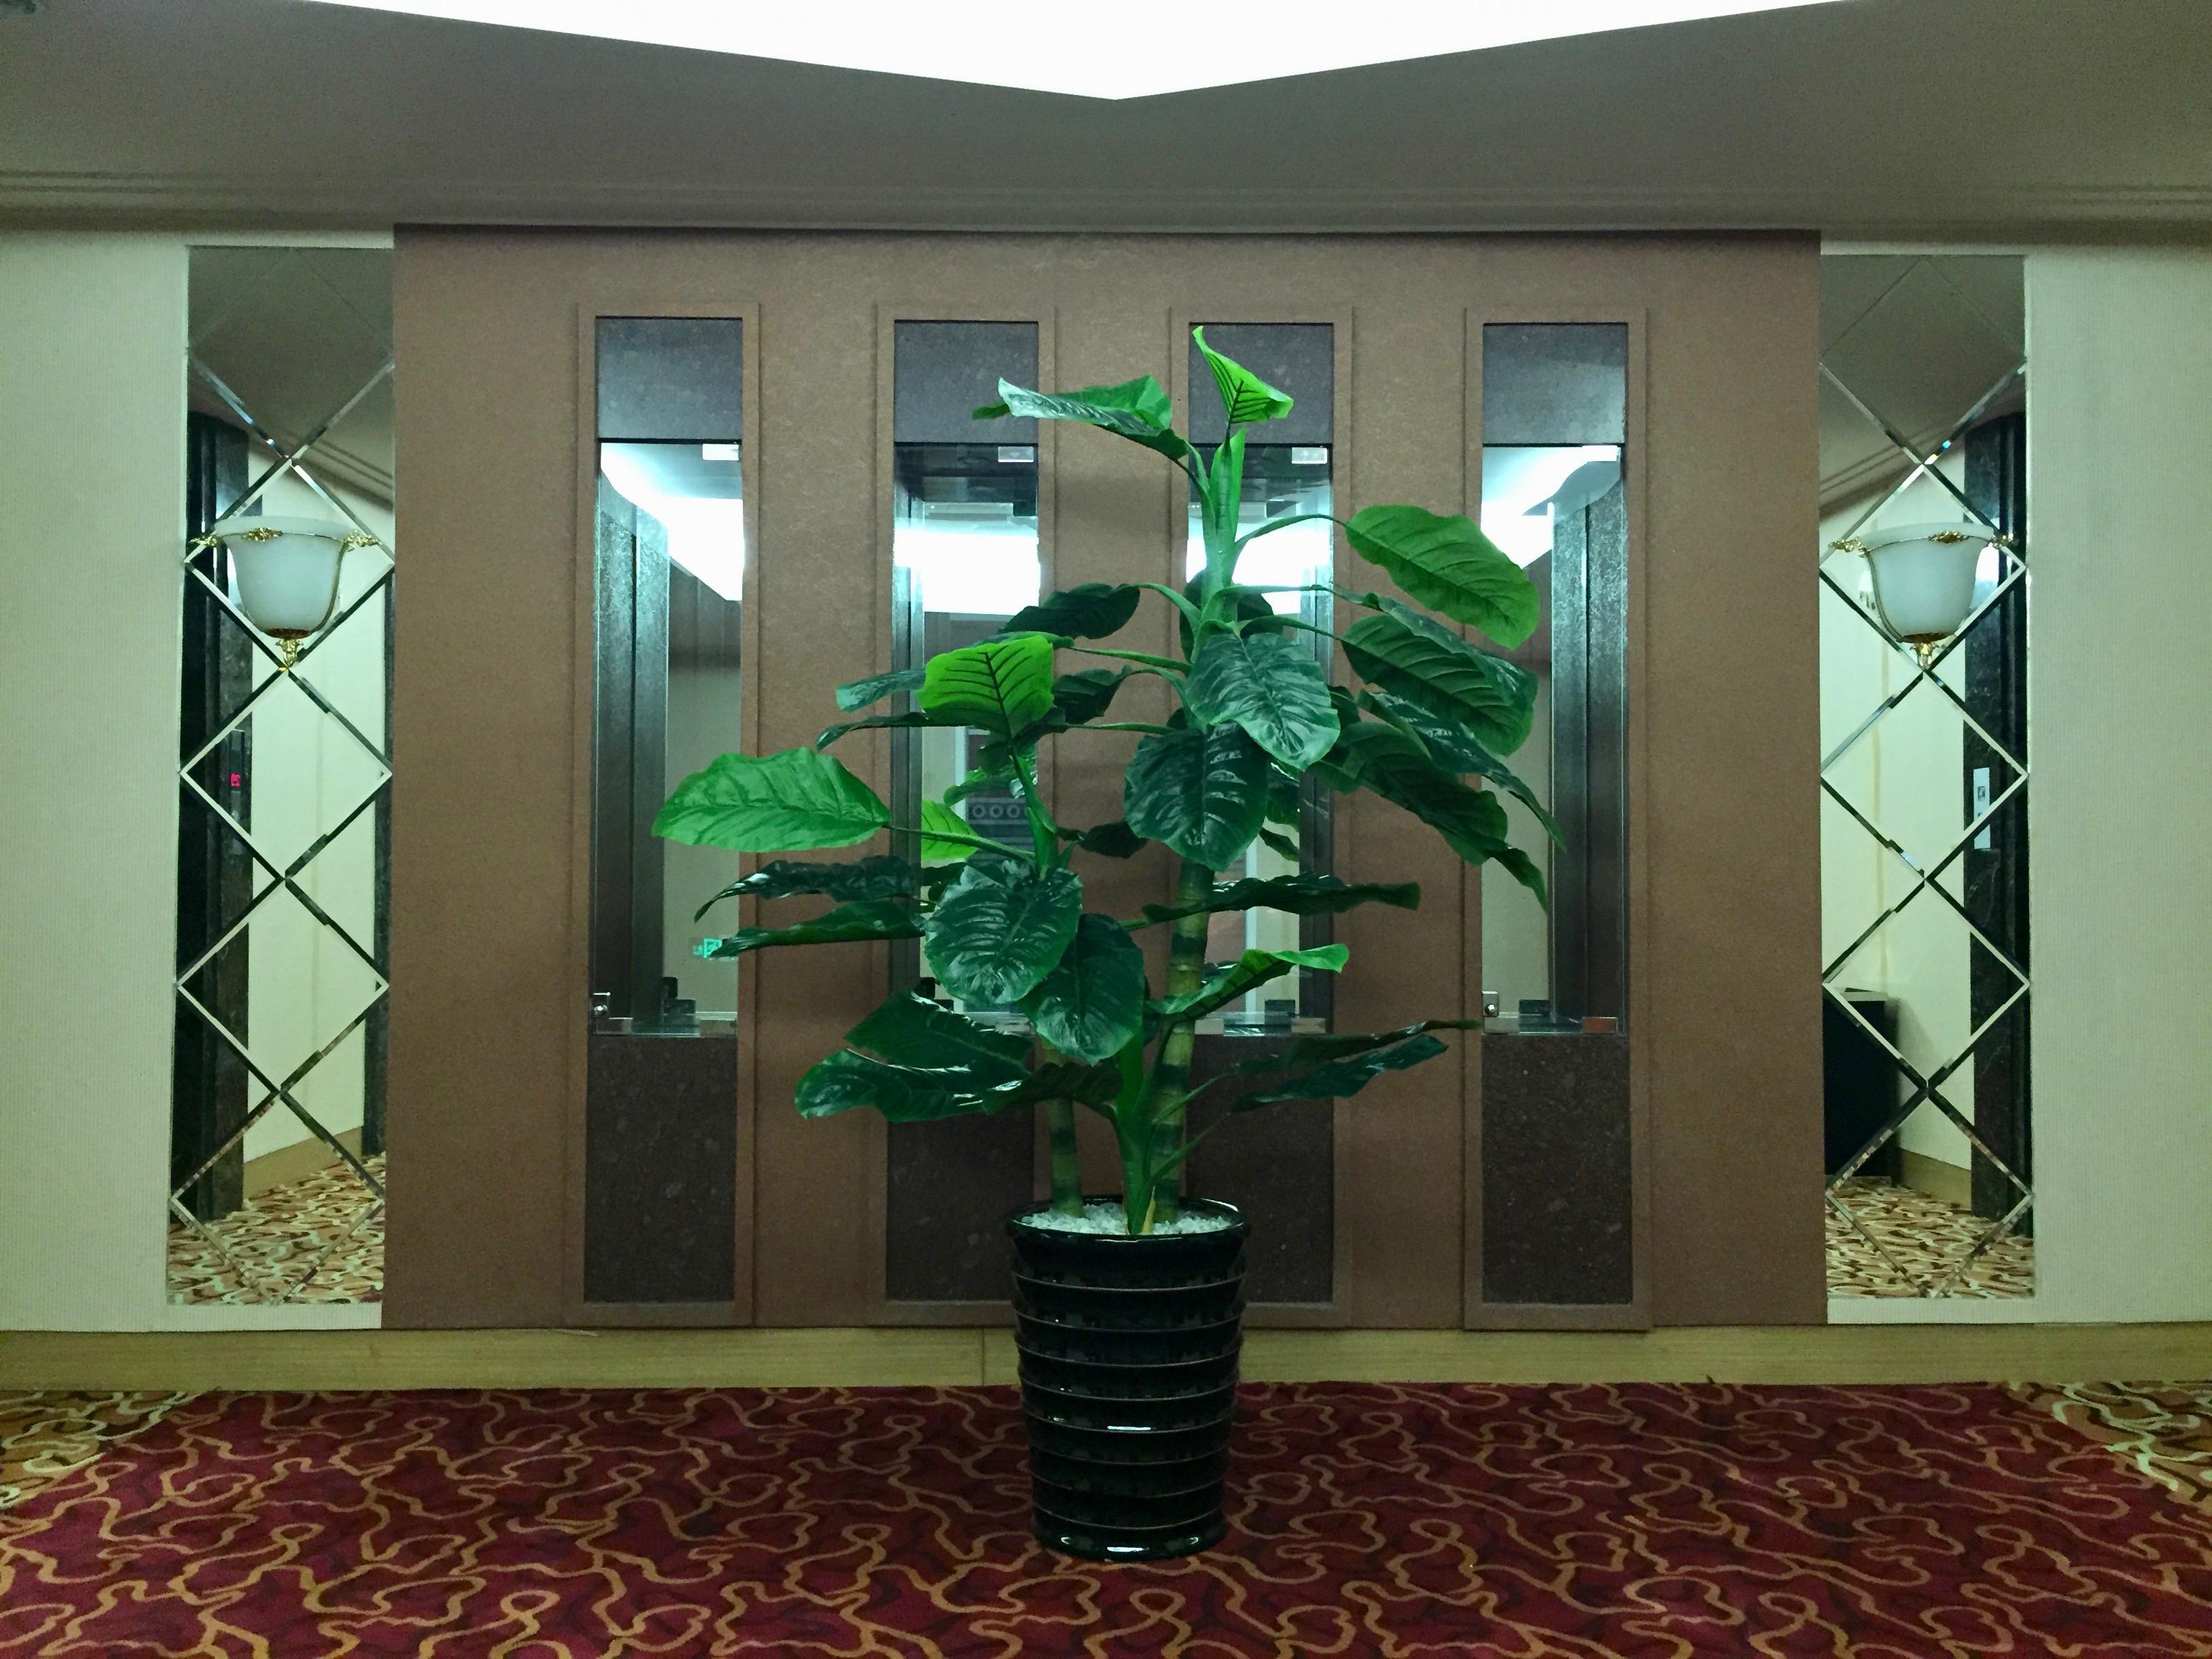 Corridors of the Sosan Hotel